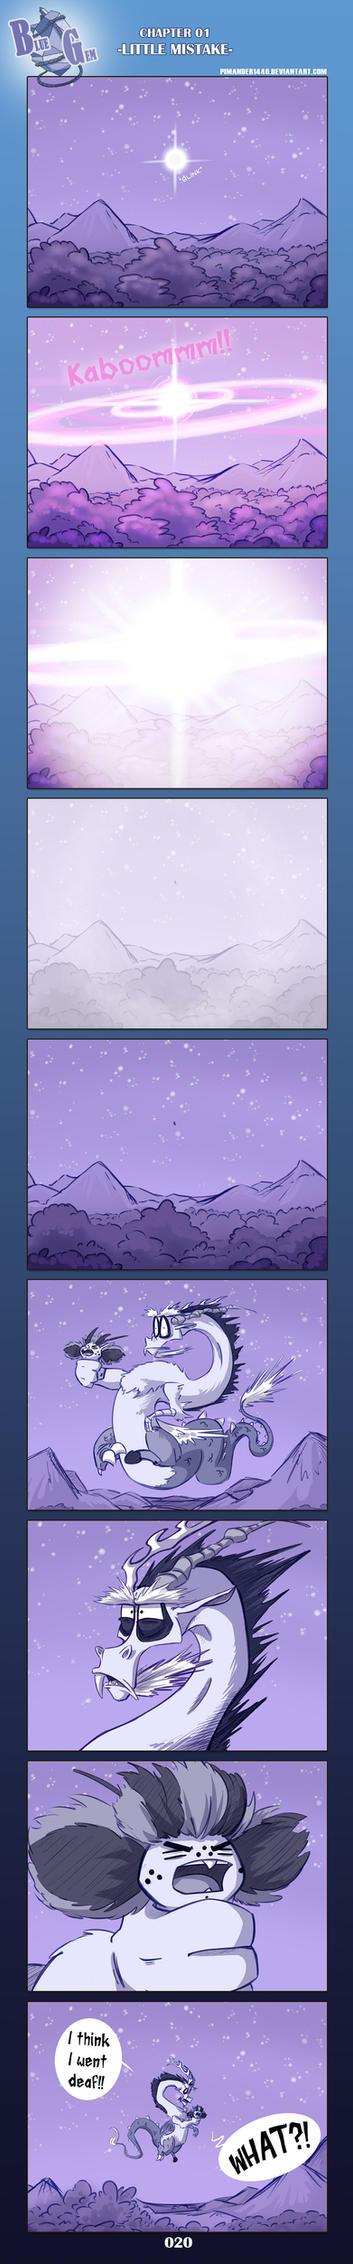 BlueGem COMIC -- Page 020 by Pimander1446